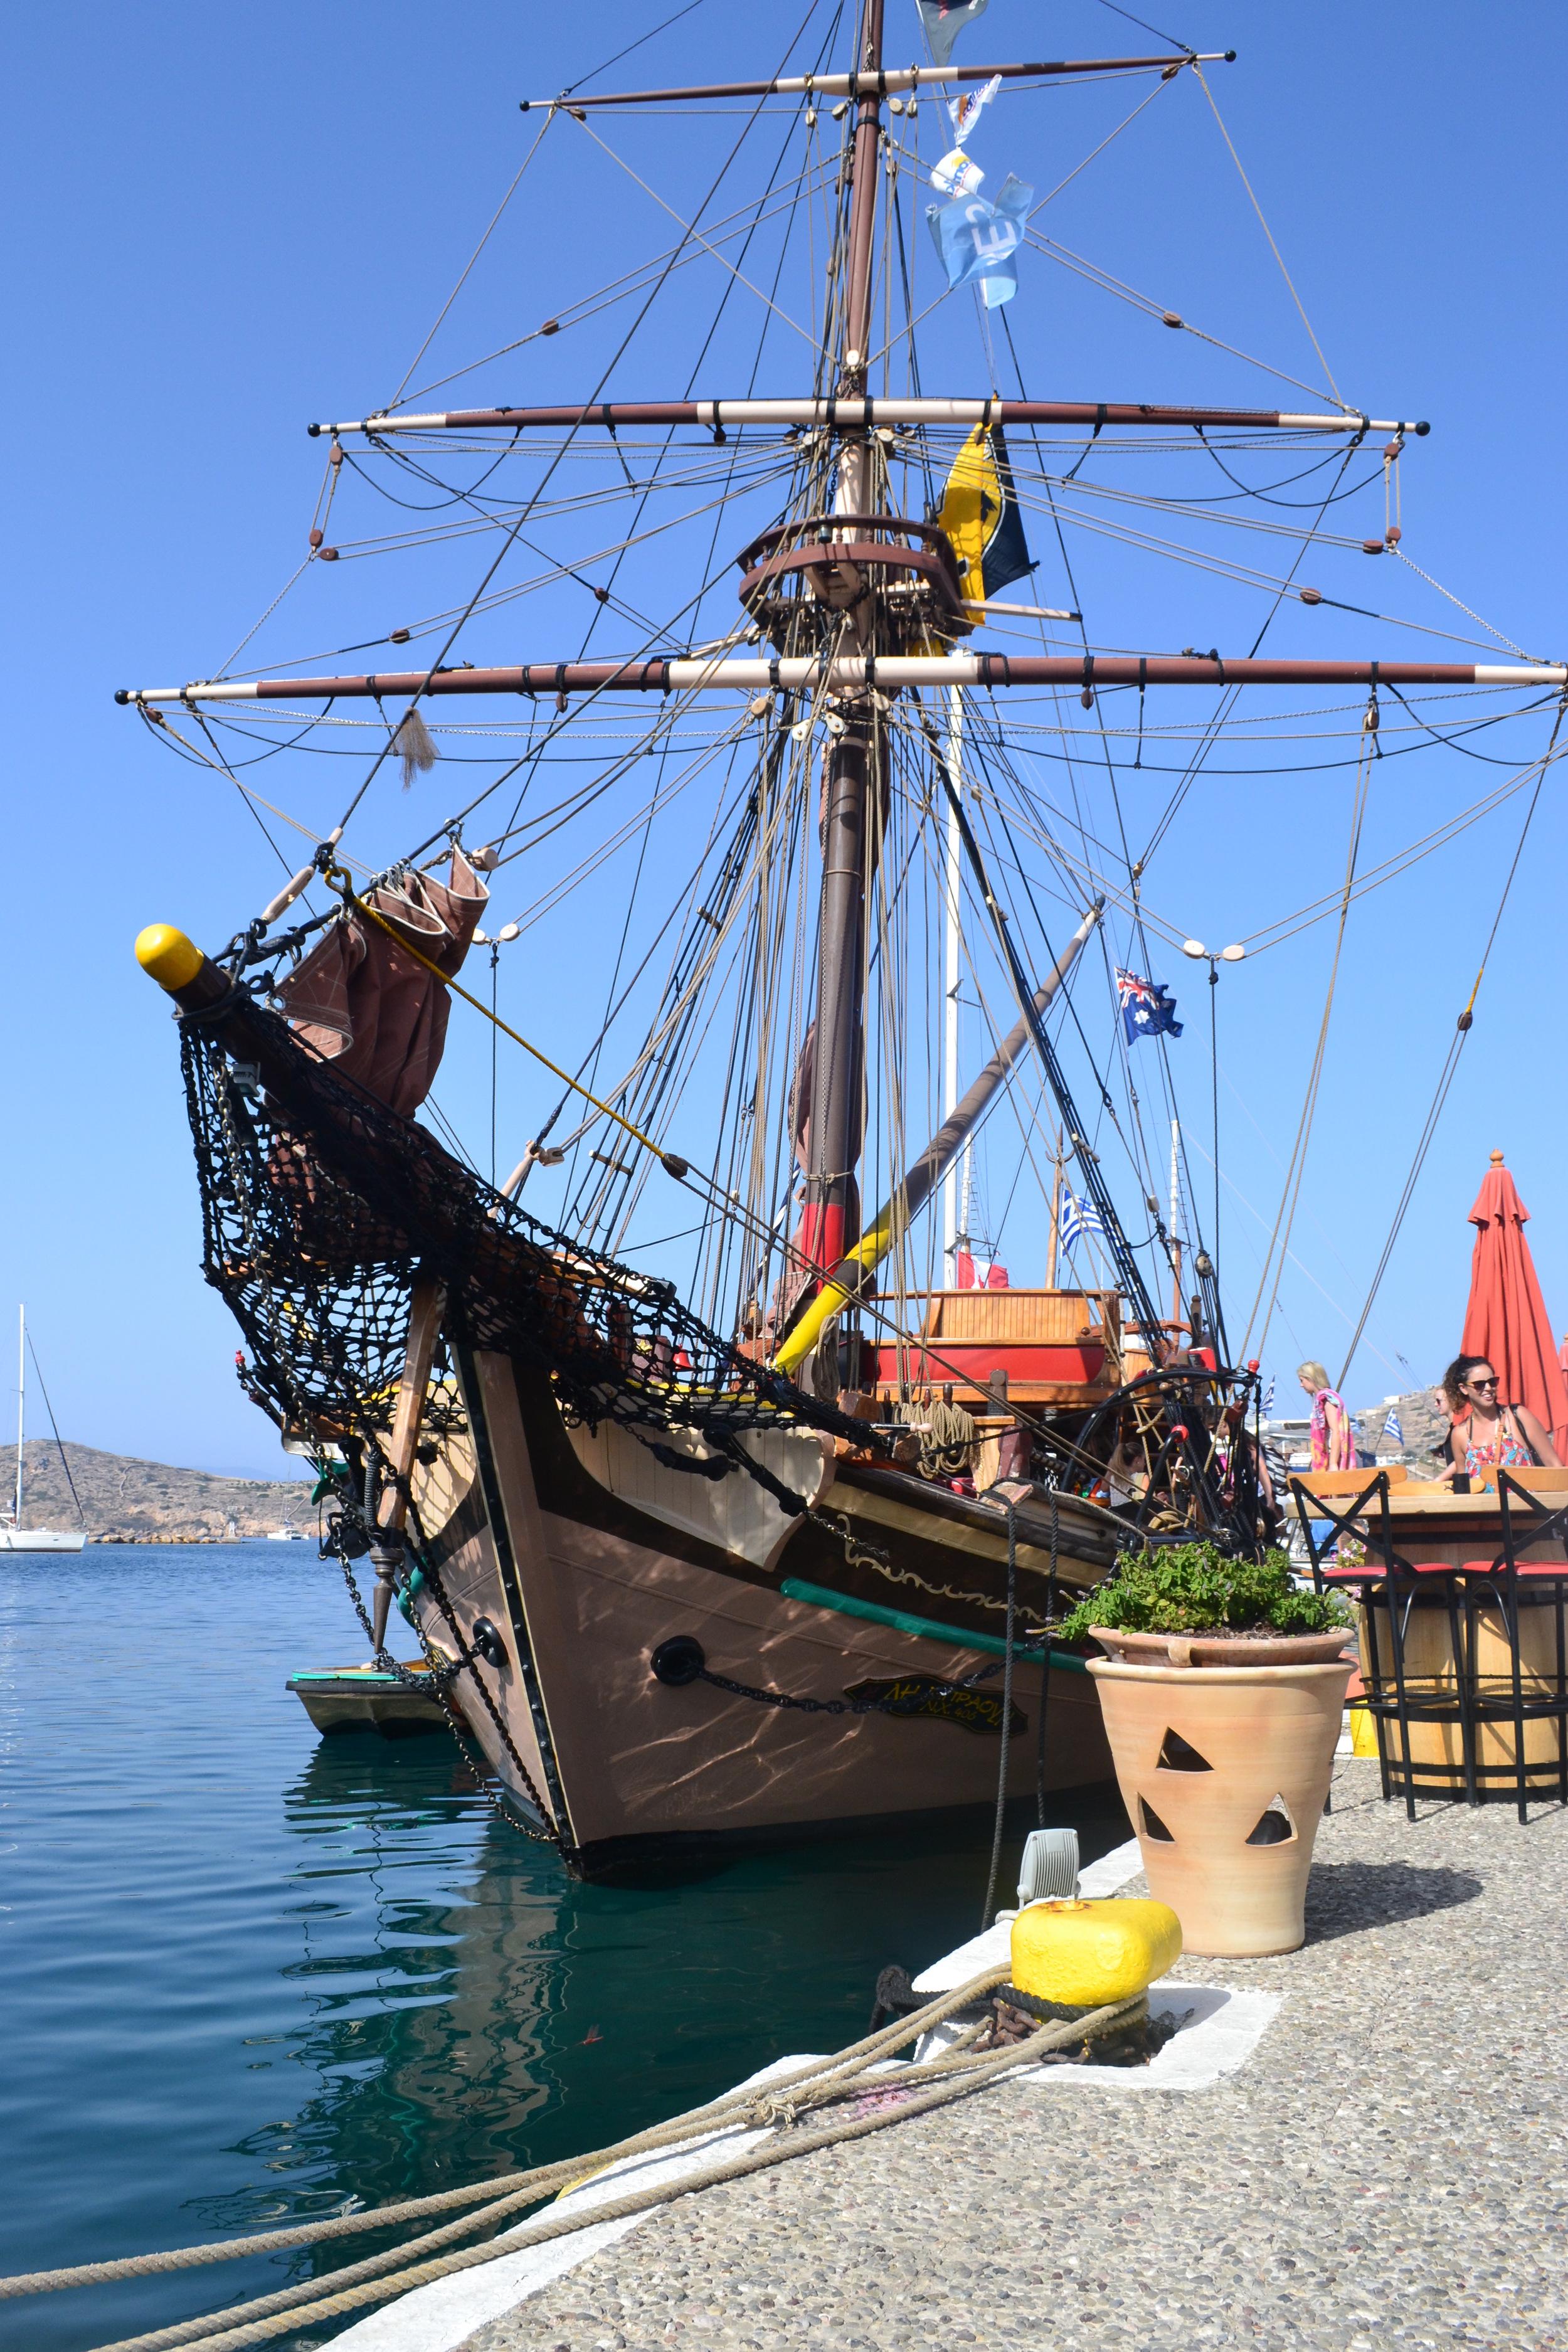 Pirate Ship Sailing Day!